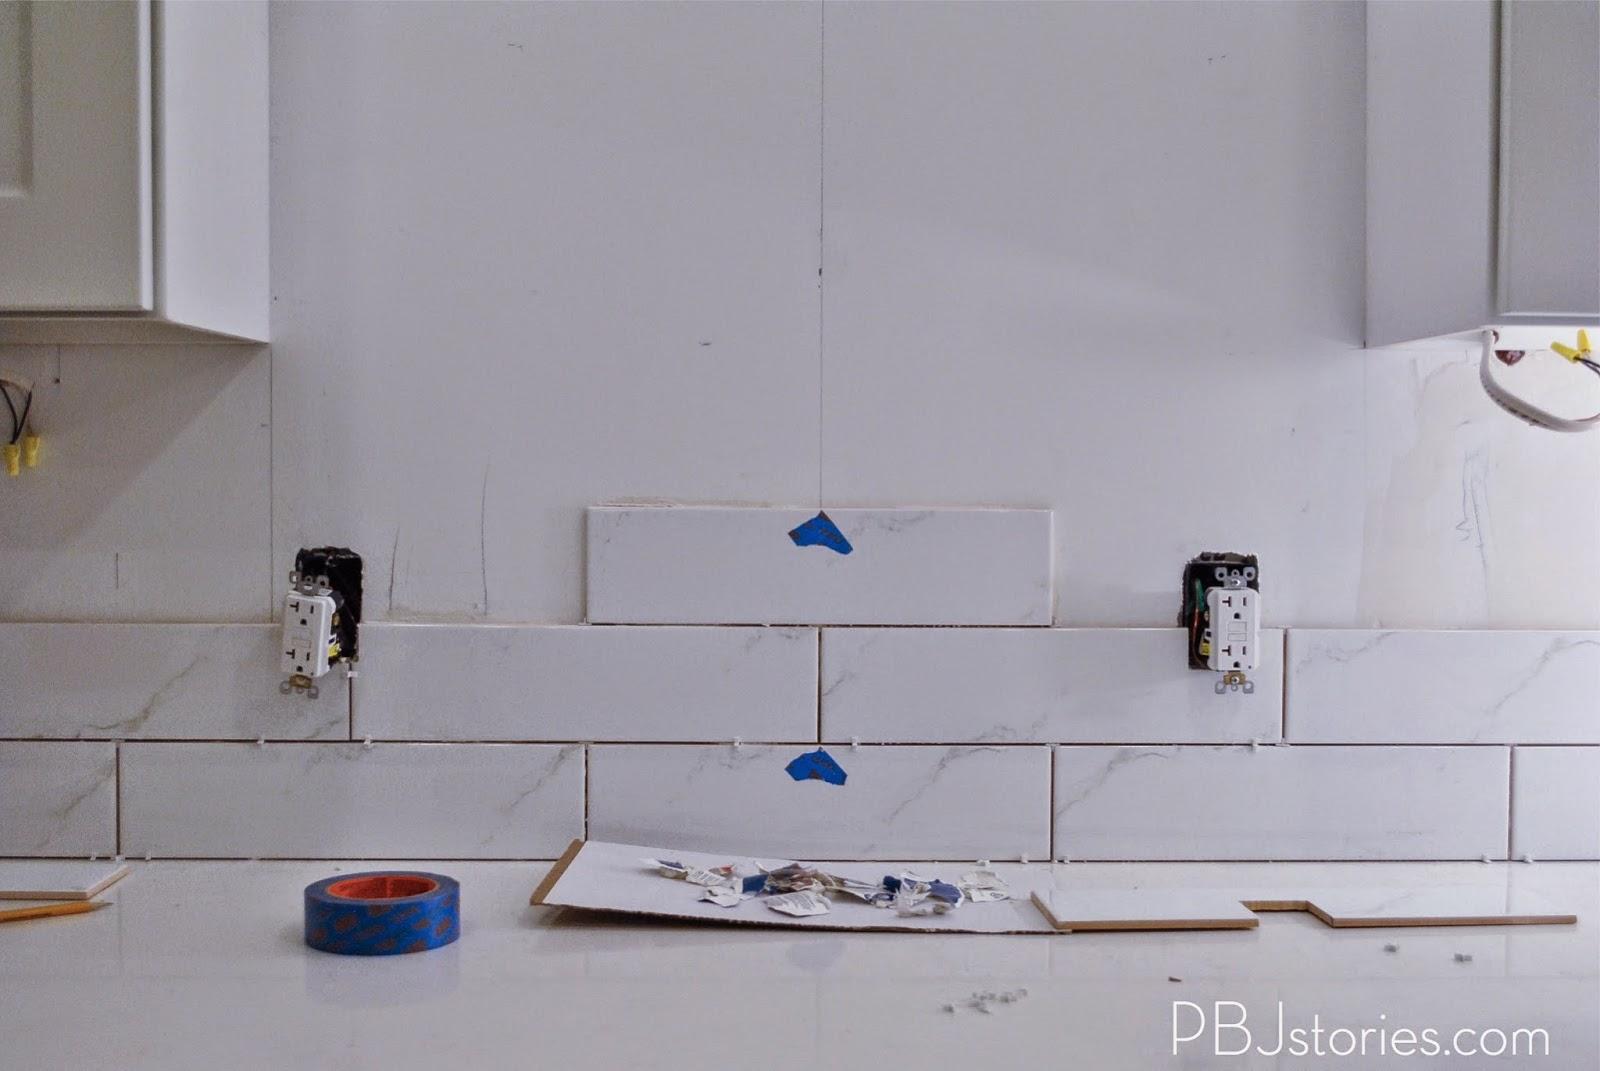 Cool 12 Ceiling Tile Tiny 2X2 Ceramic Floor Tile Rectangular 2X4 Ceiling Tile 2X4 White Ceramic Subway Tile Youthful 3D Ceramic Wall Tiles Red3X6 Travertine Subway Tile Backsplash PBJstories: Installing Subway Tile For Kitchen Backsplash ..